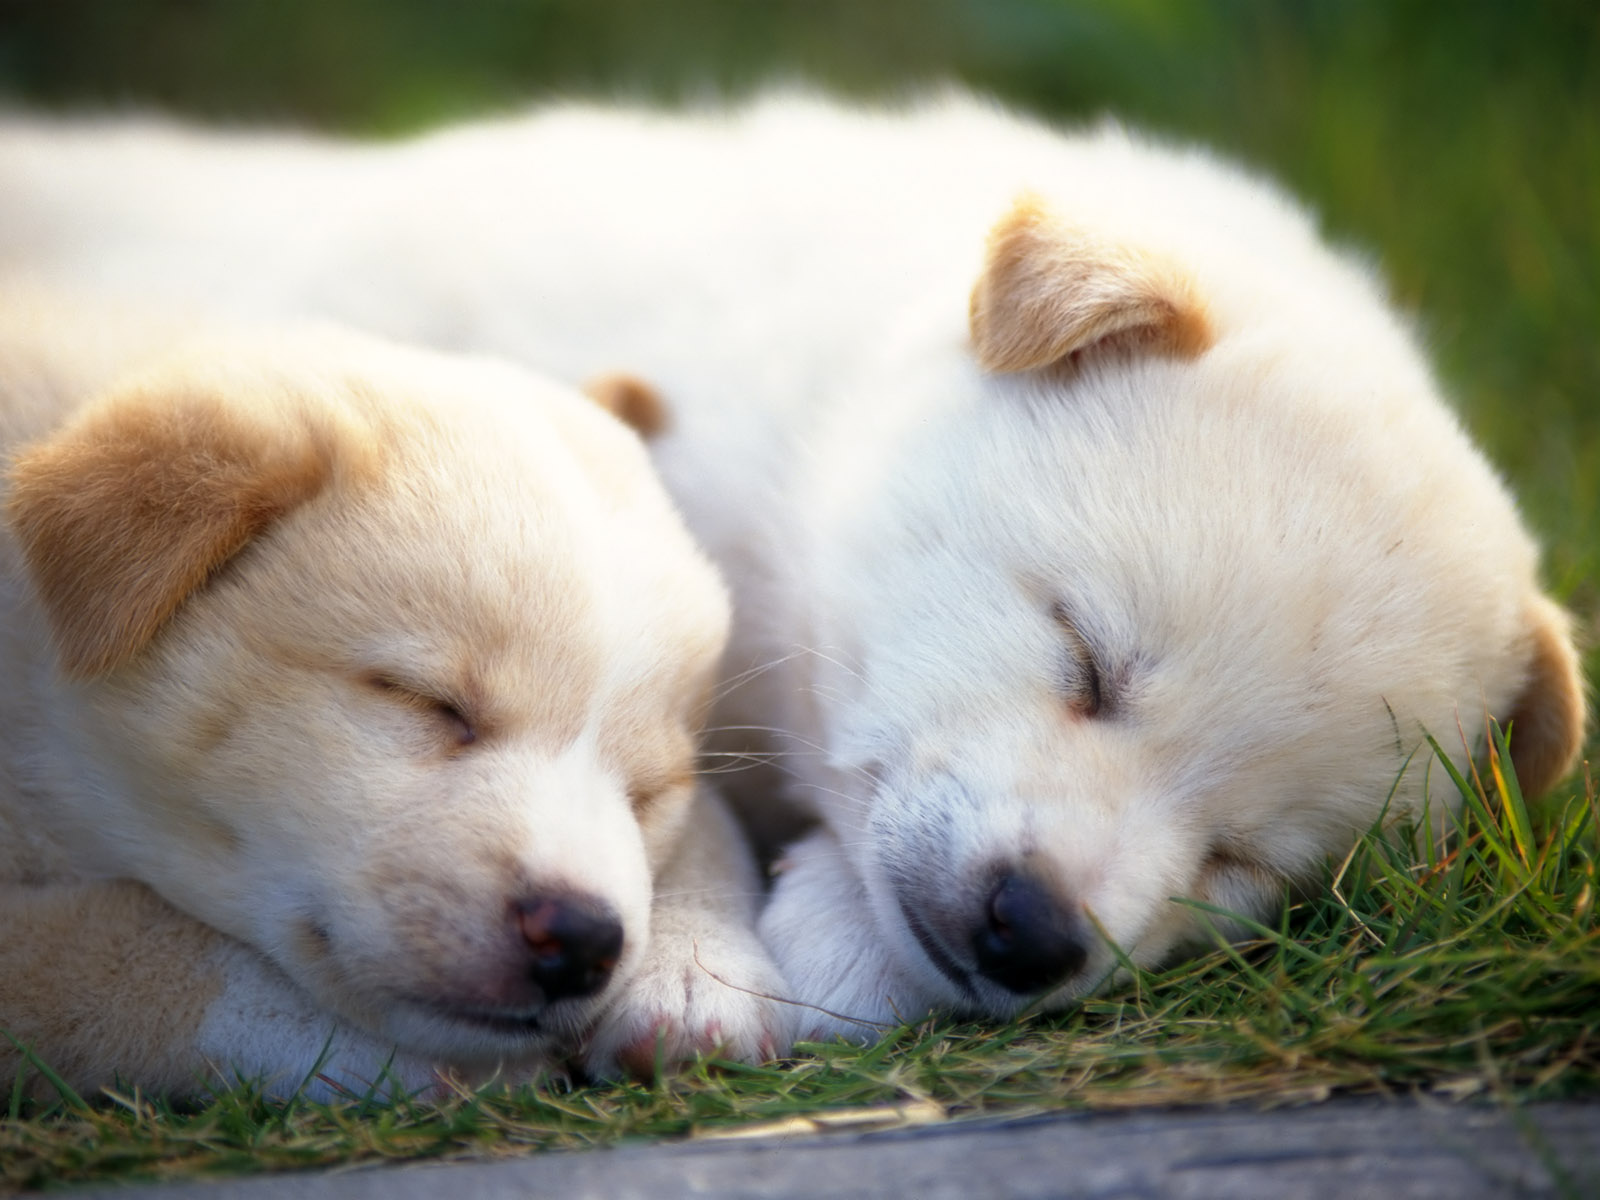 fotos de perritos - photo #31